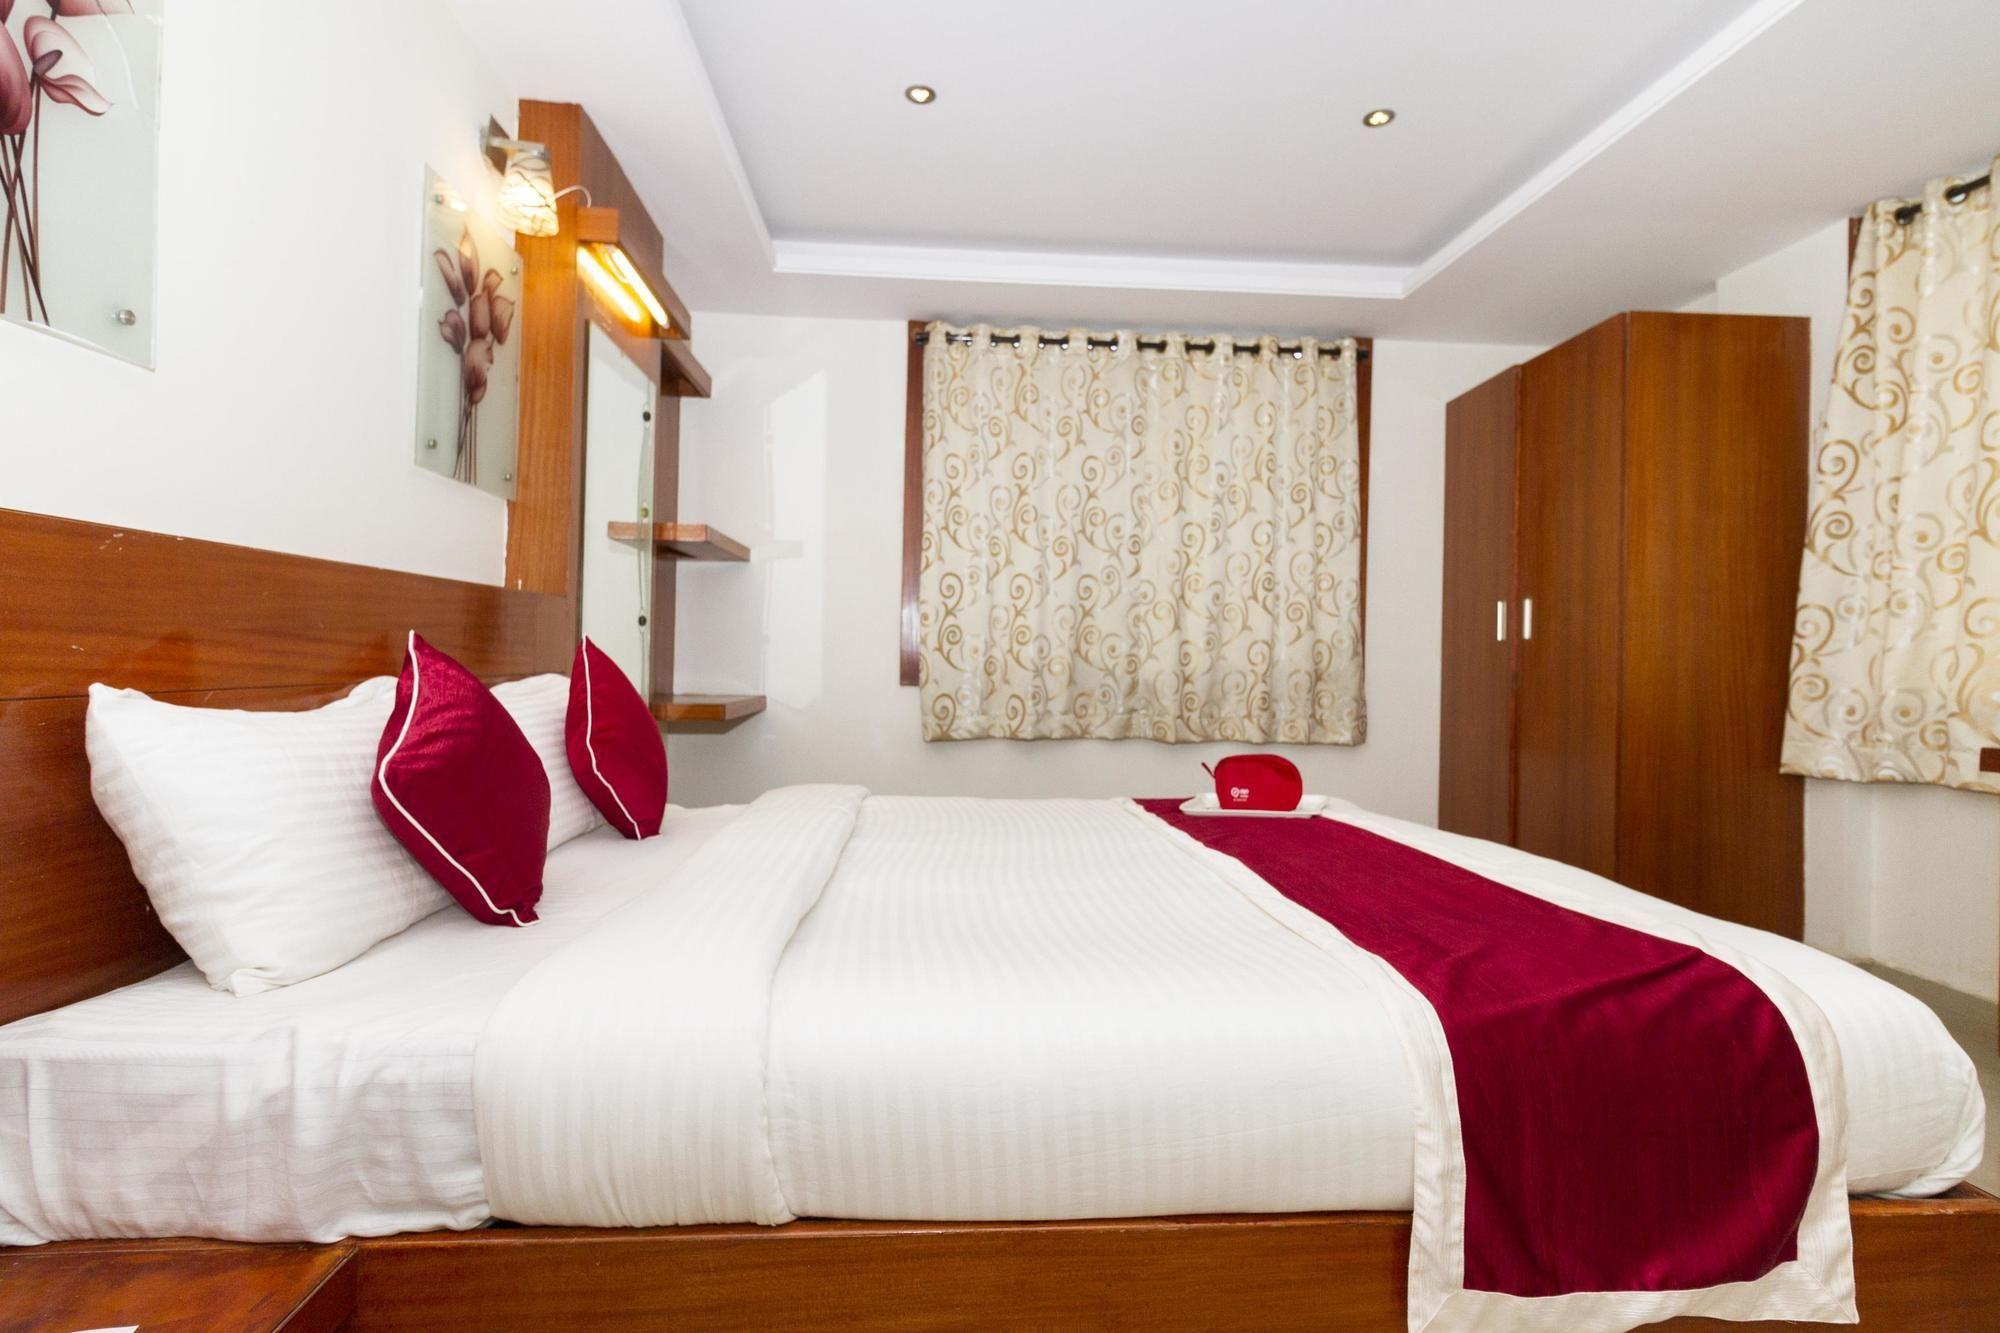 OYO Rooms Koramangala 4th Block